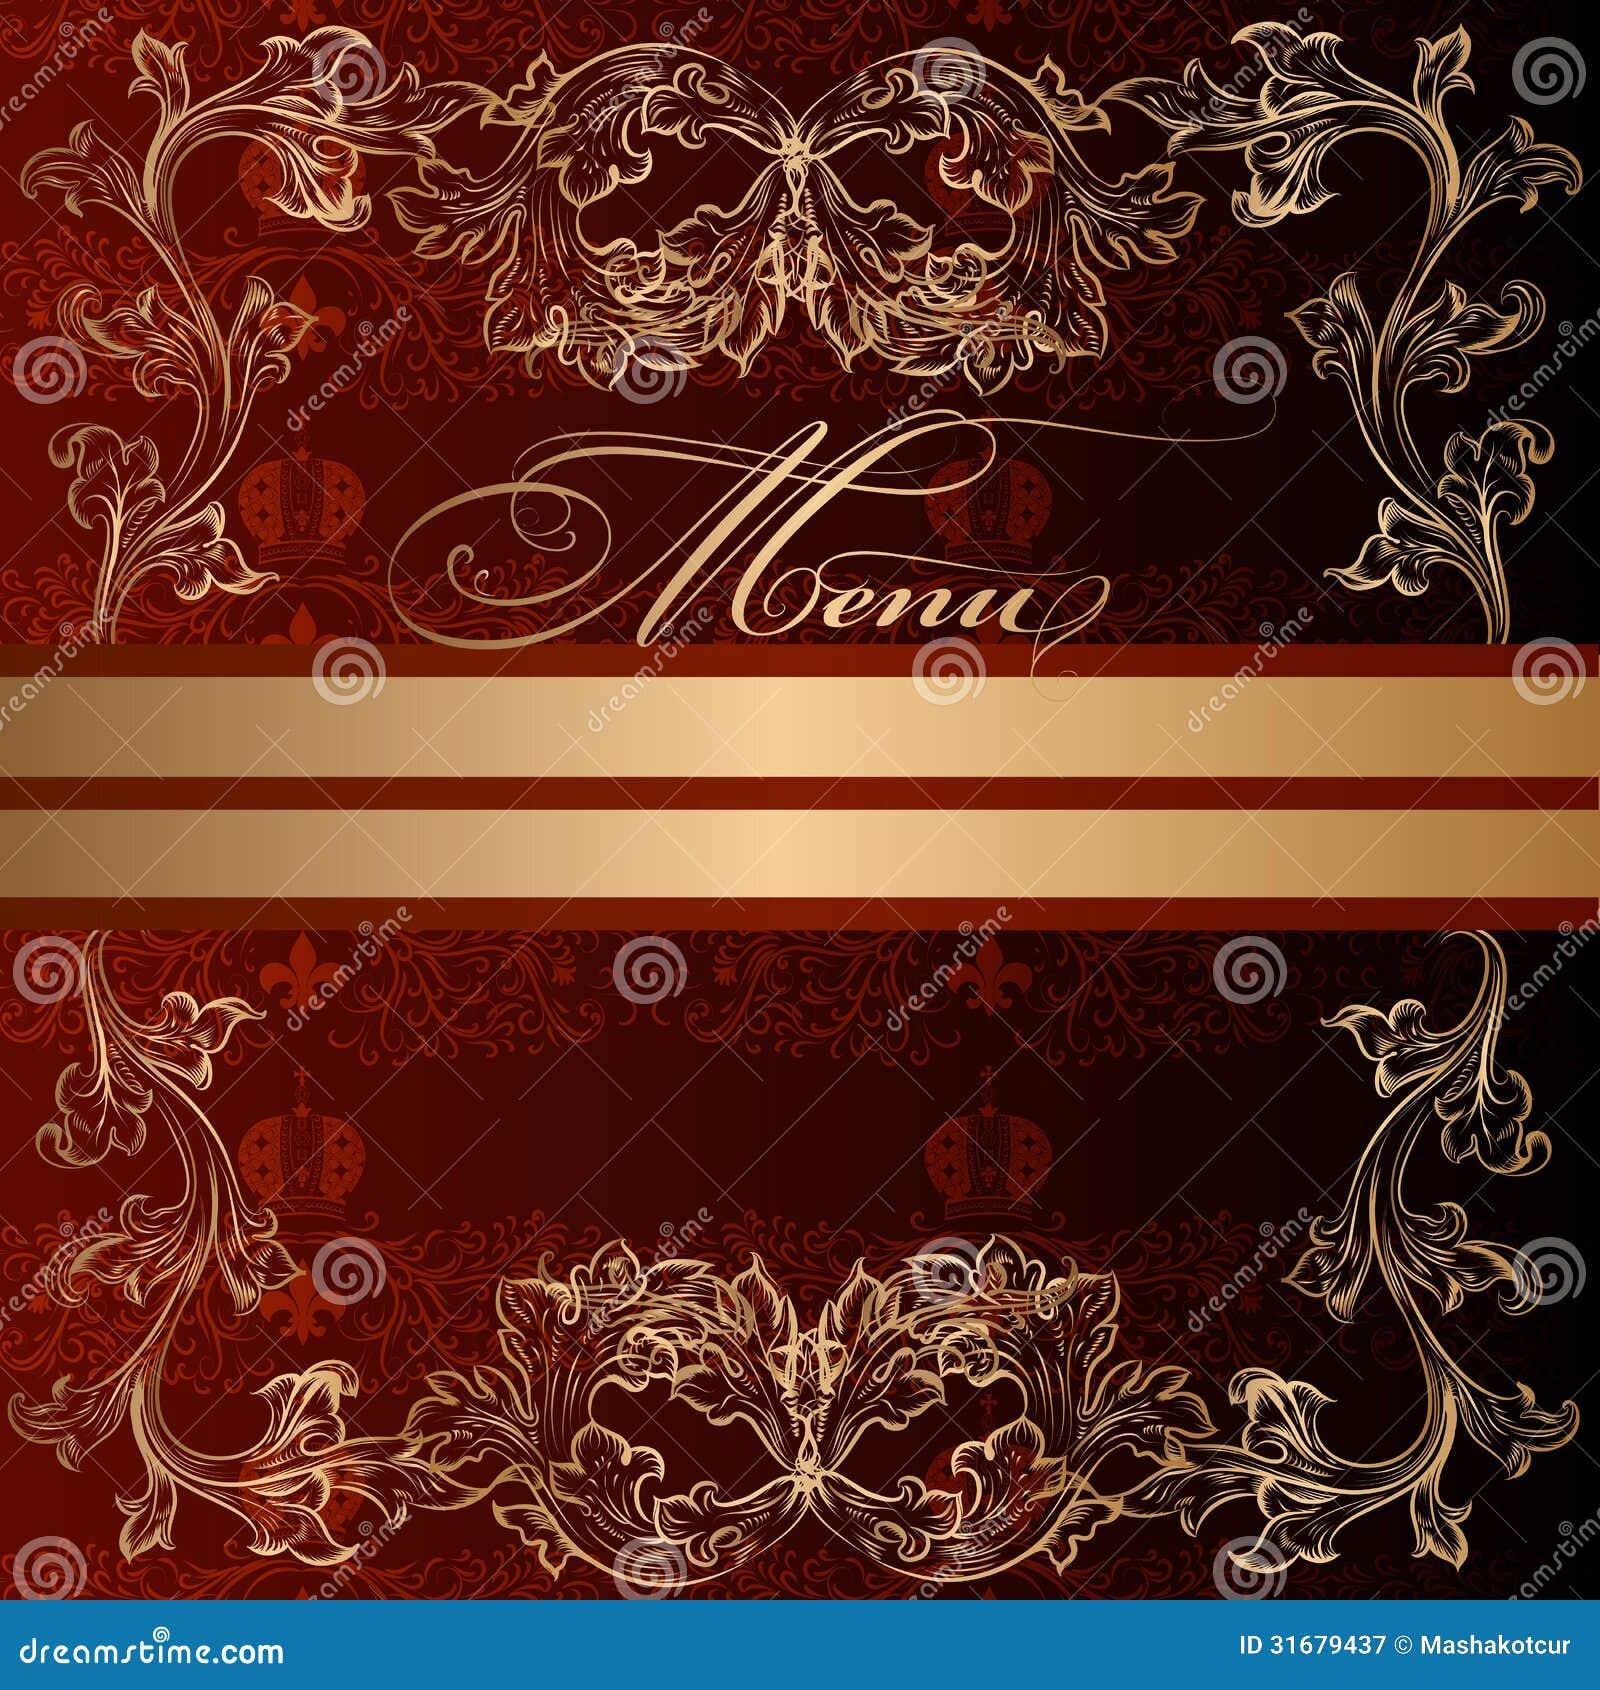 Elegant Invitation Card In Royal Luxury Style Stock Vector ...